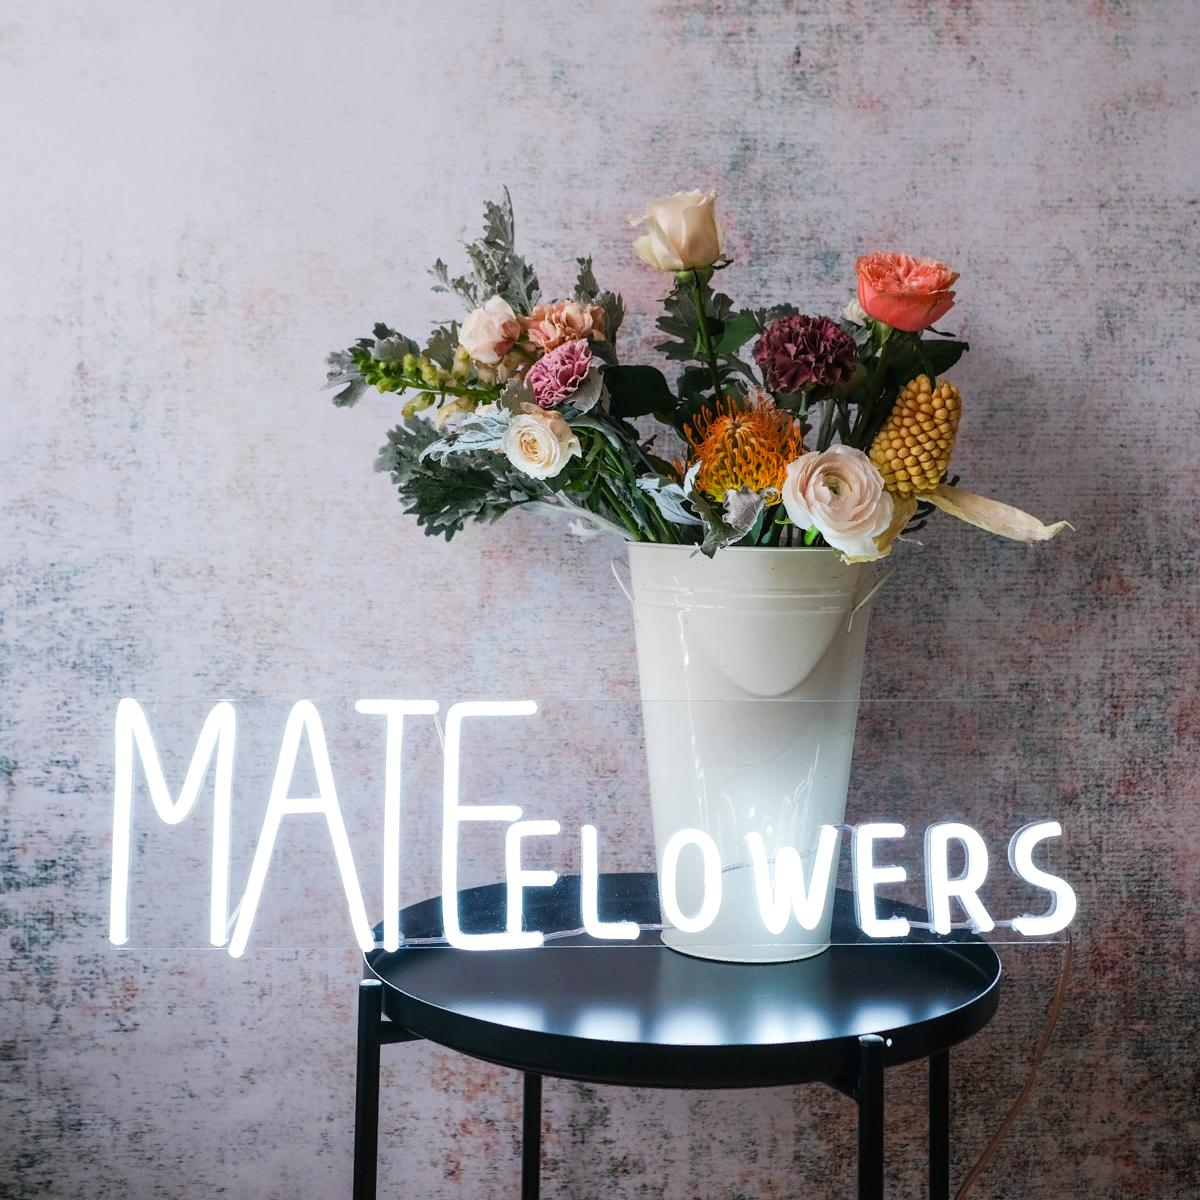 Сертификат на мастер-класс Mate flowers  от MATE Flowers